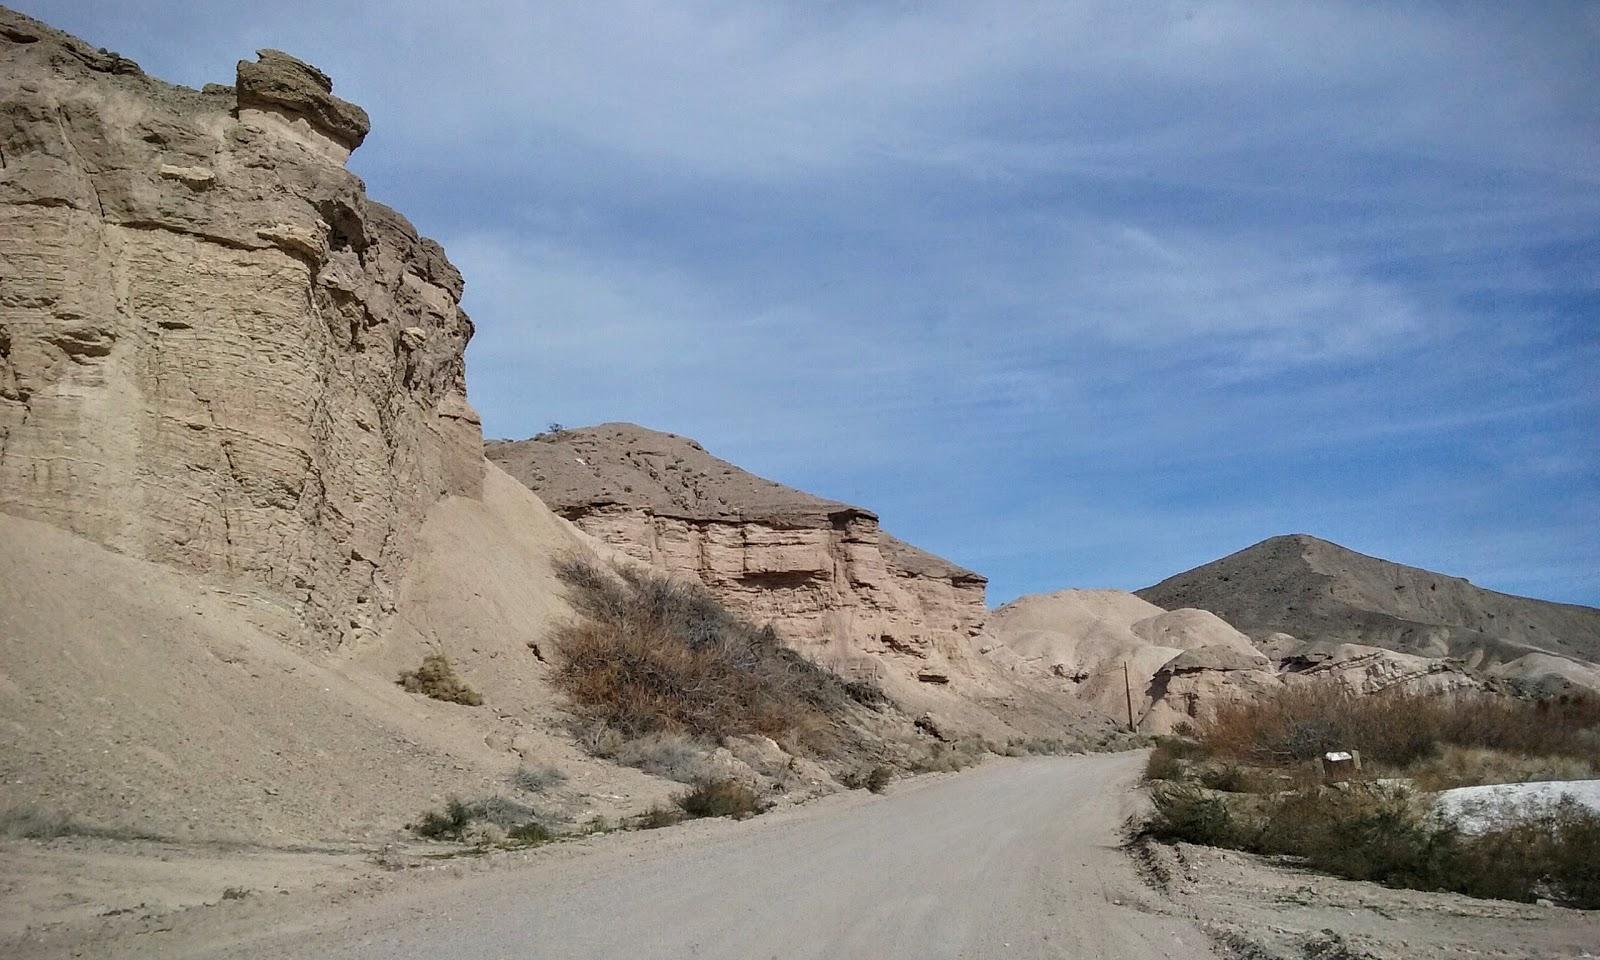 carretera sin pavimentar casi llegando a china ranch